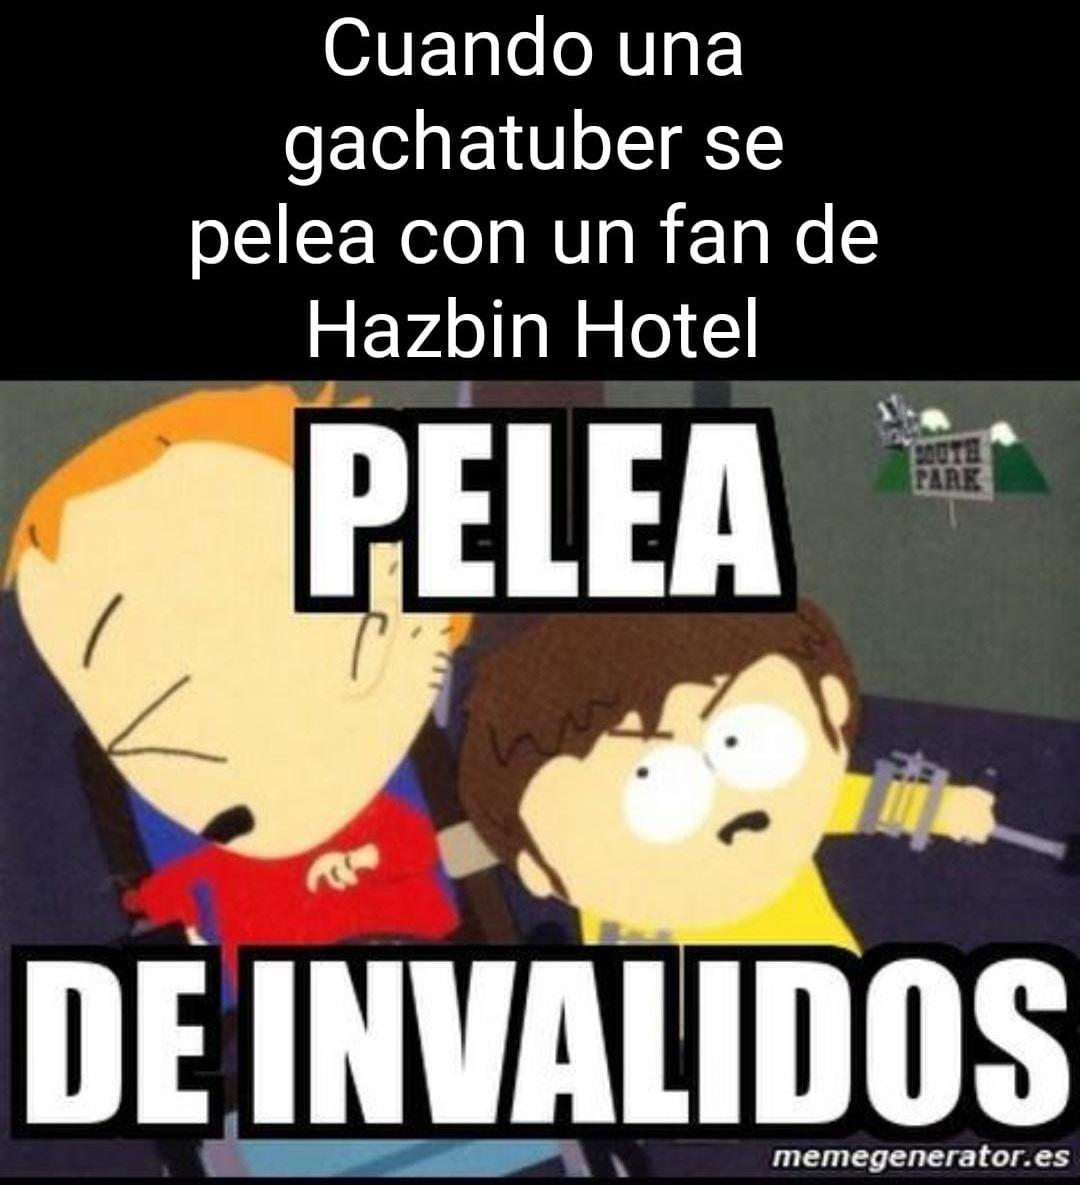 South park - Meme subido por -pedro_benjamin-5 :) Memedroid